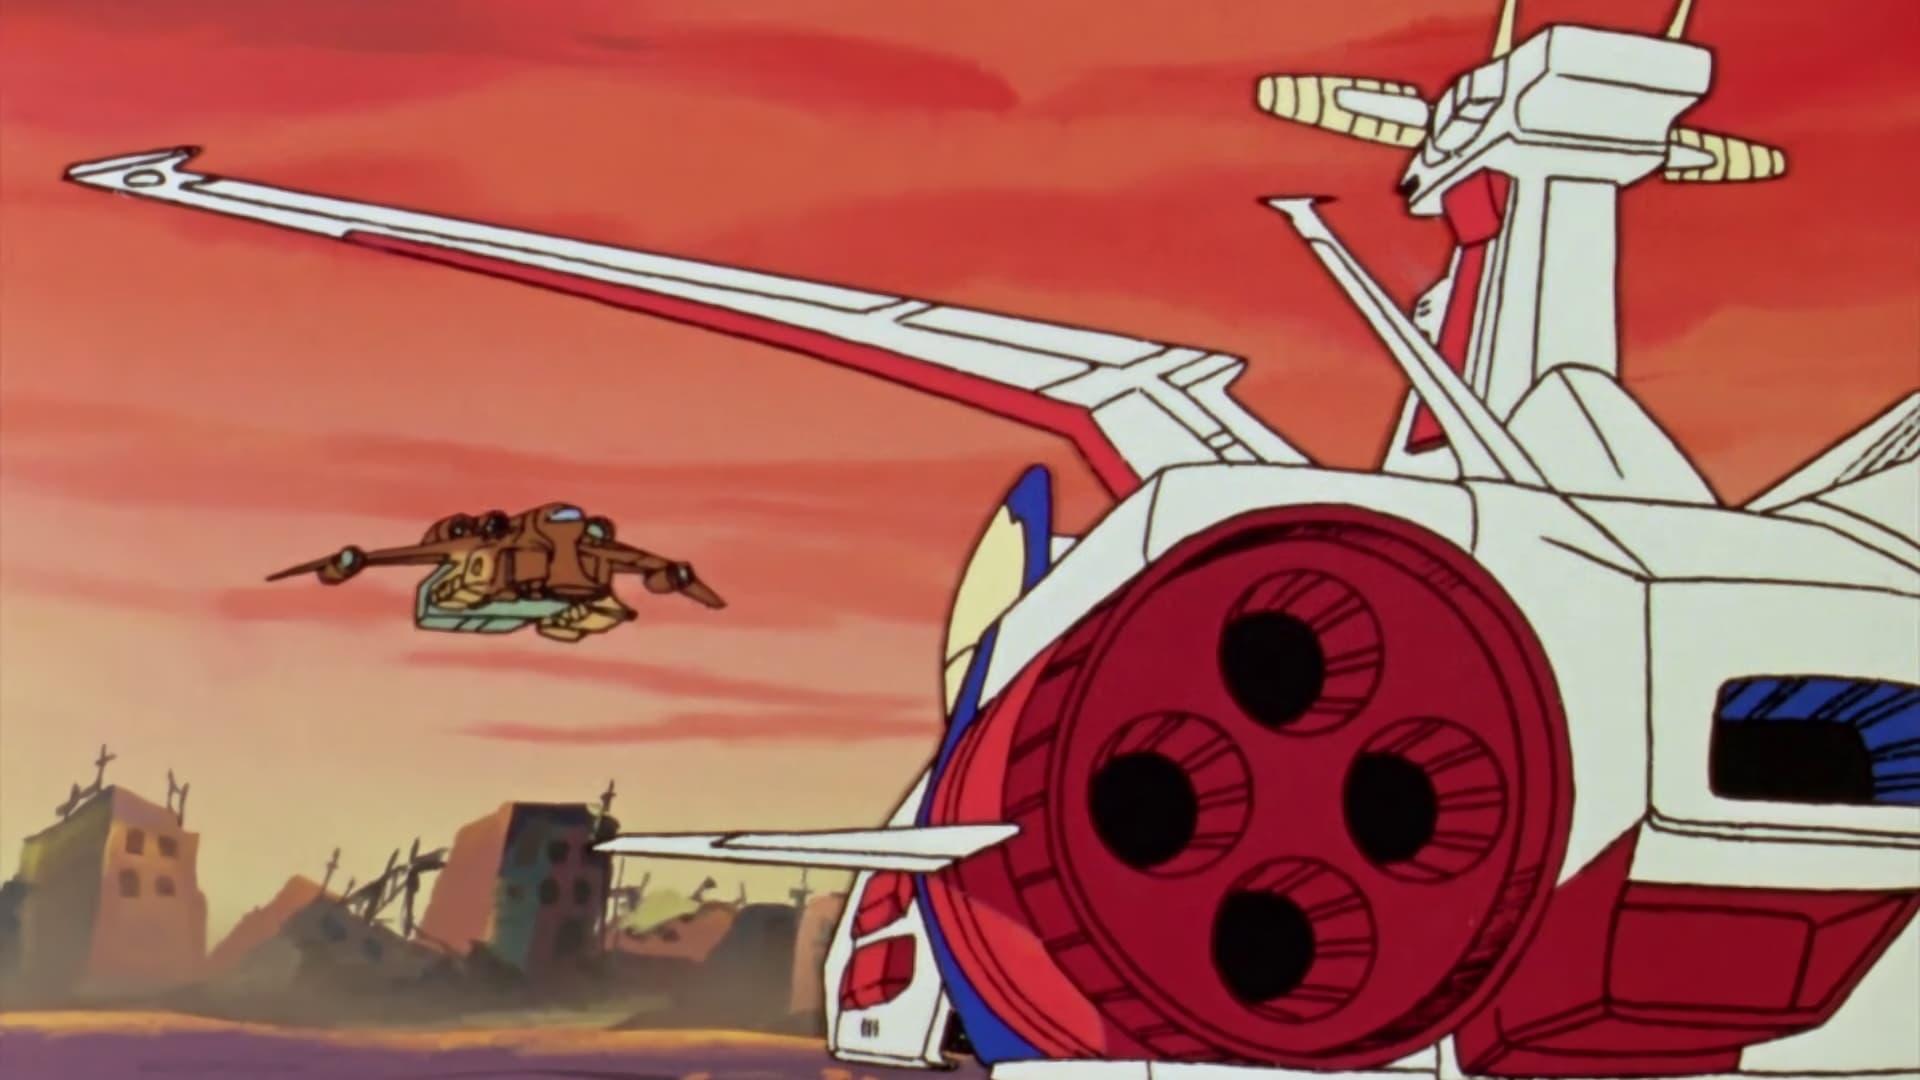 Regarder Mobile Suit Gundam en streaming gratuit